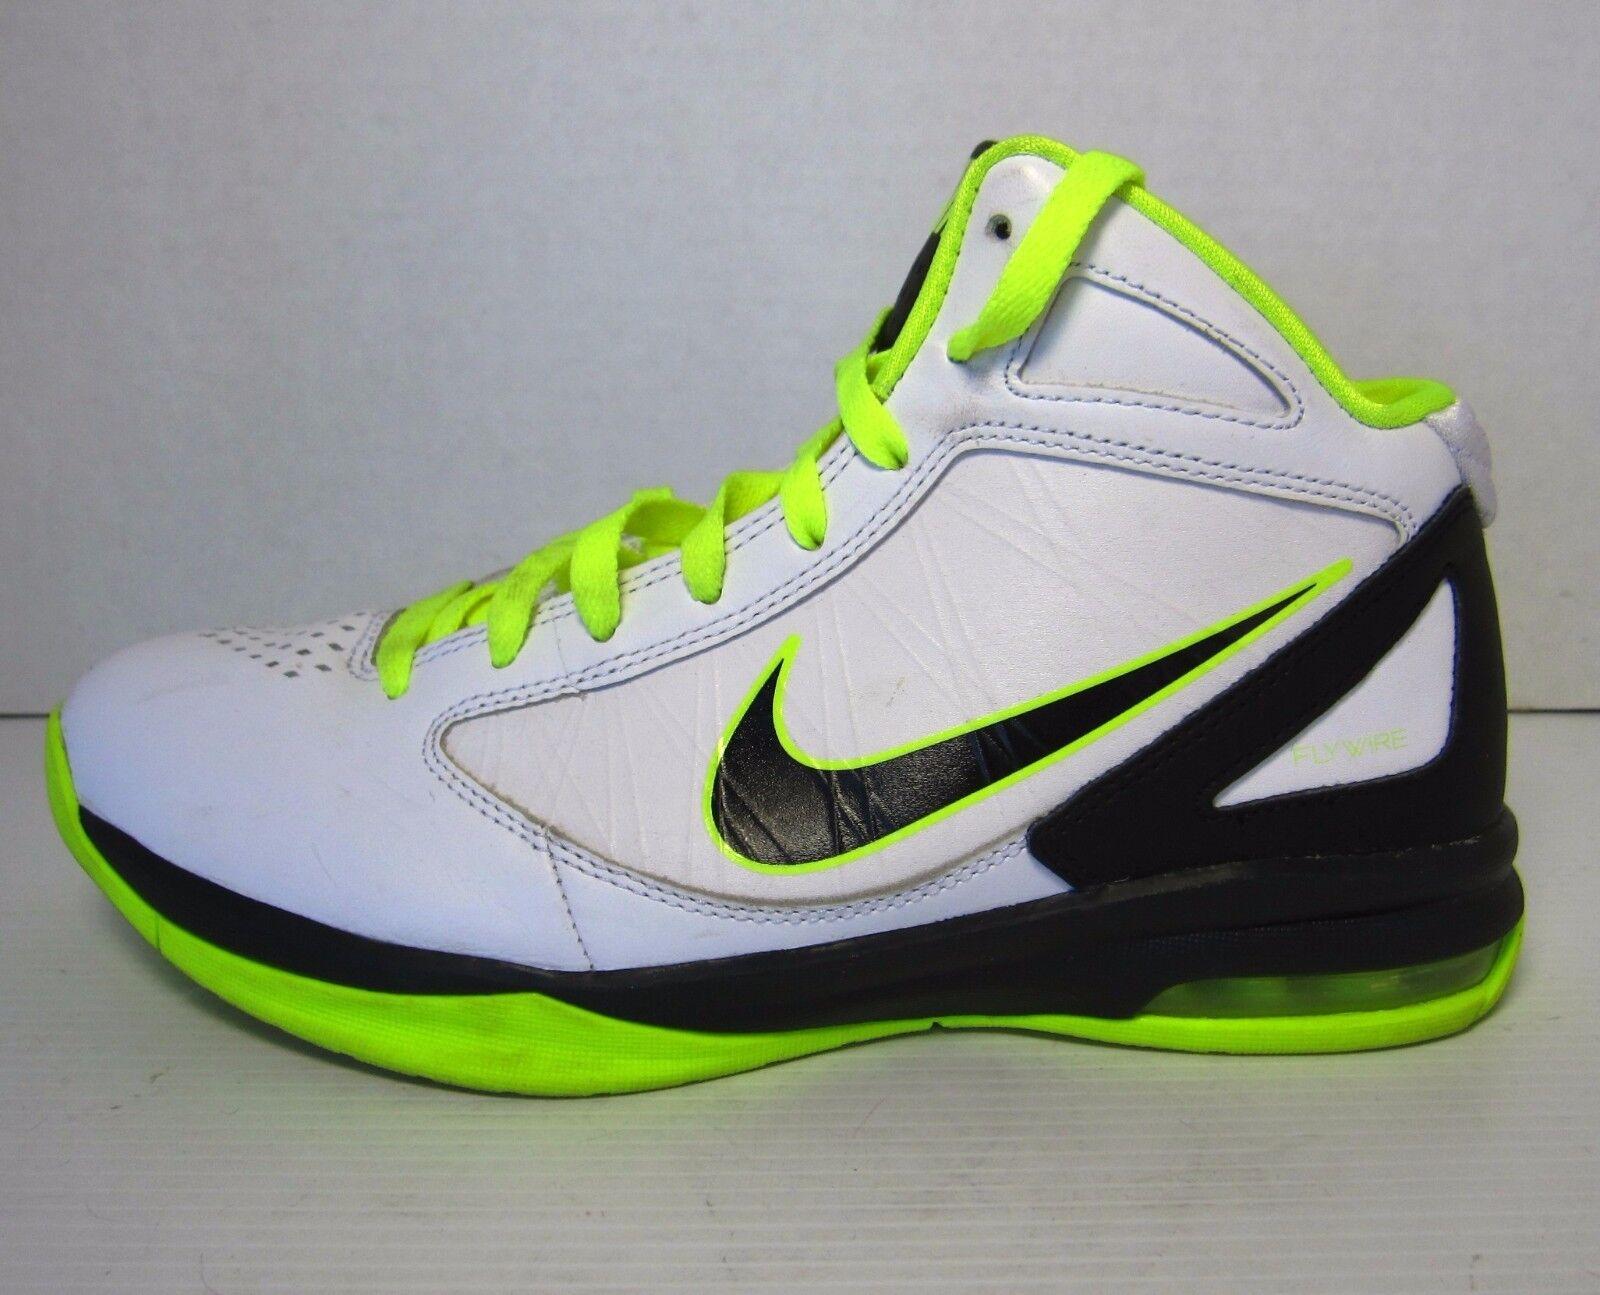 Nike air scarpe max destino (454091 101), scarpe air da basket 8 bianco 563031